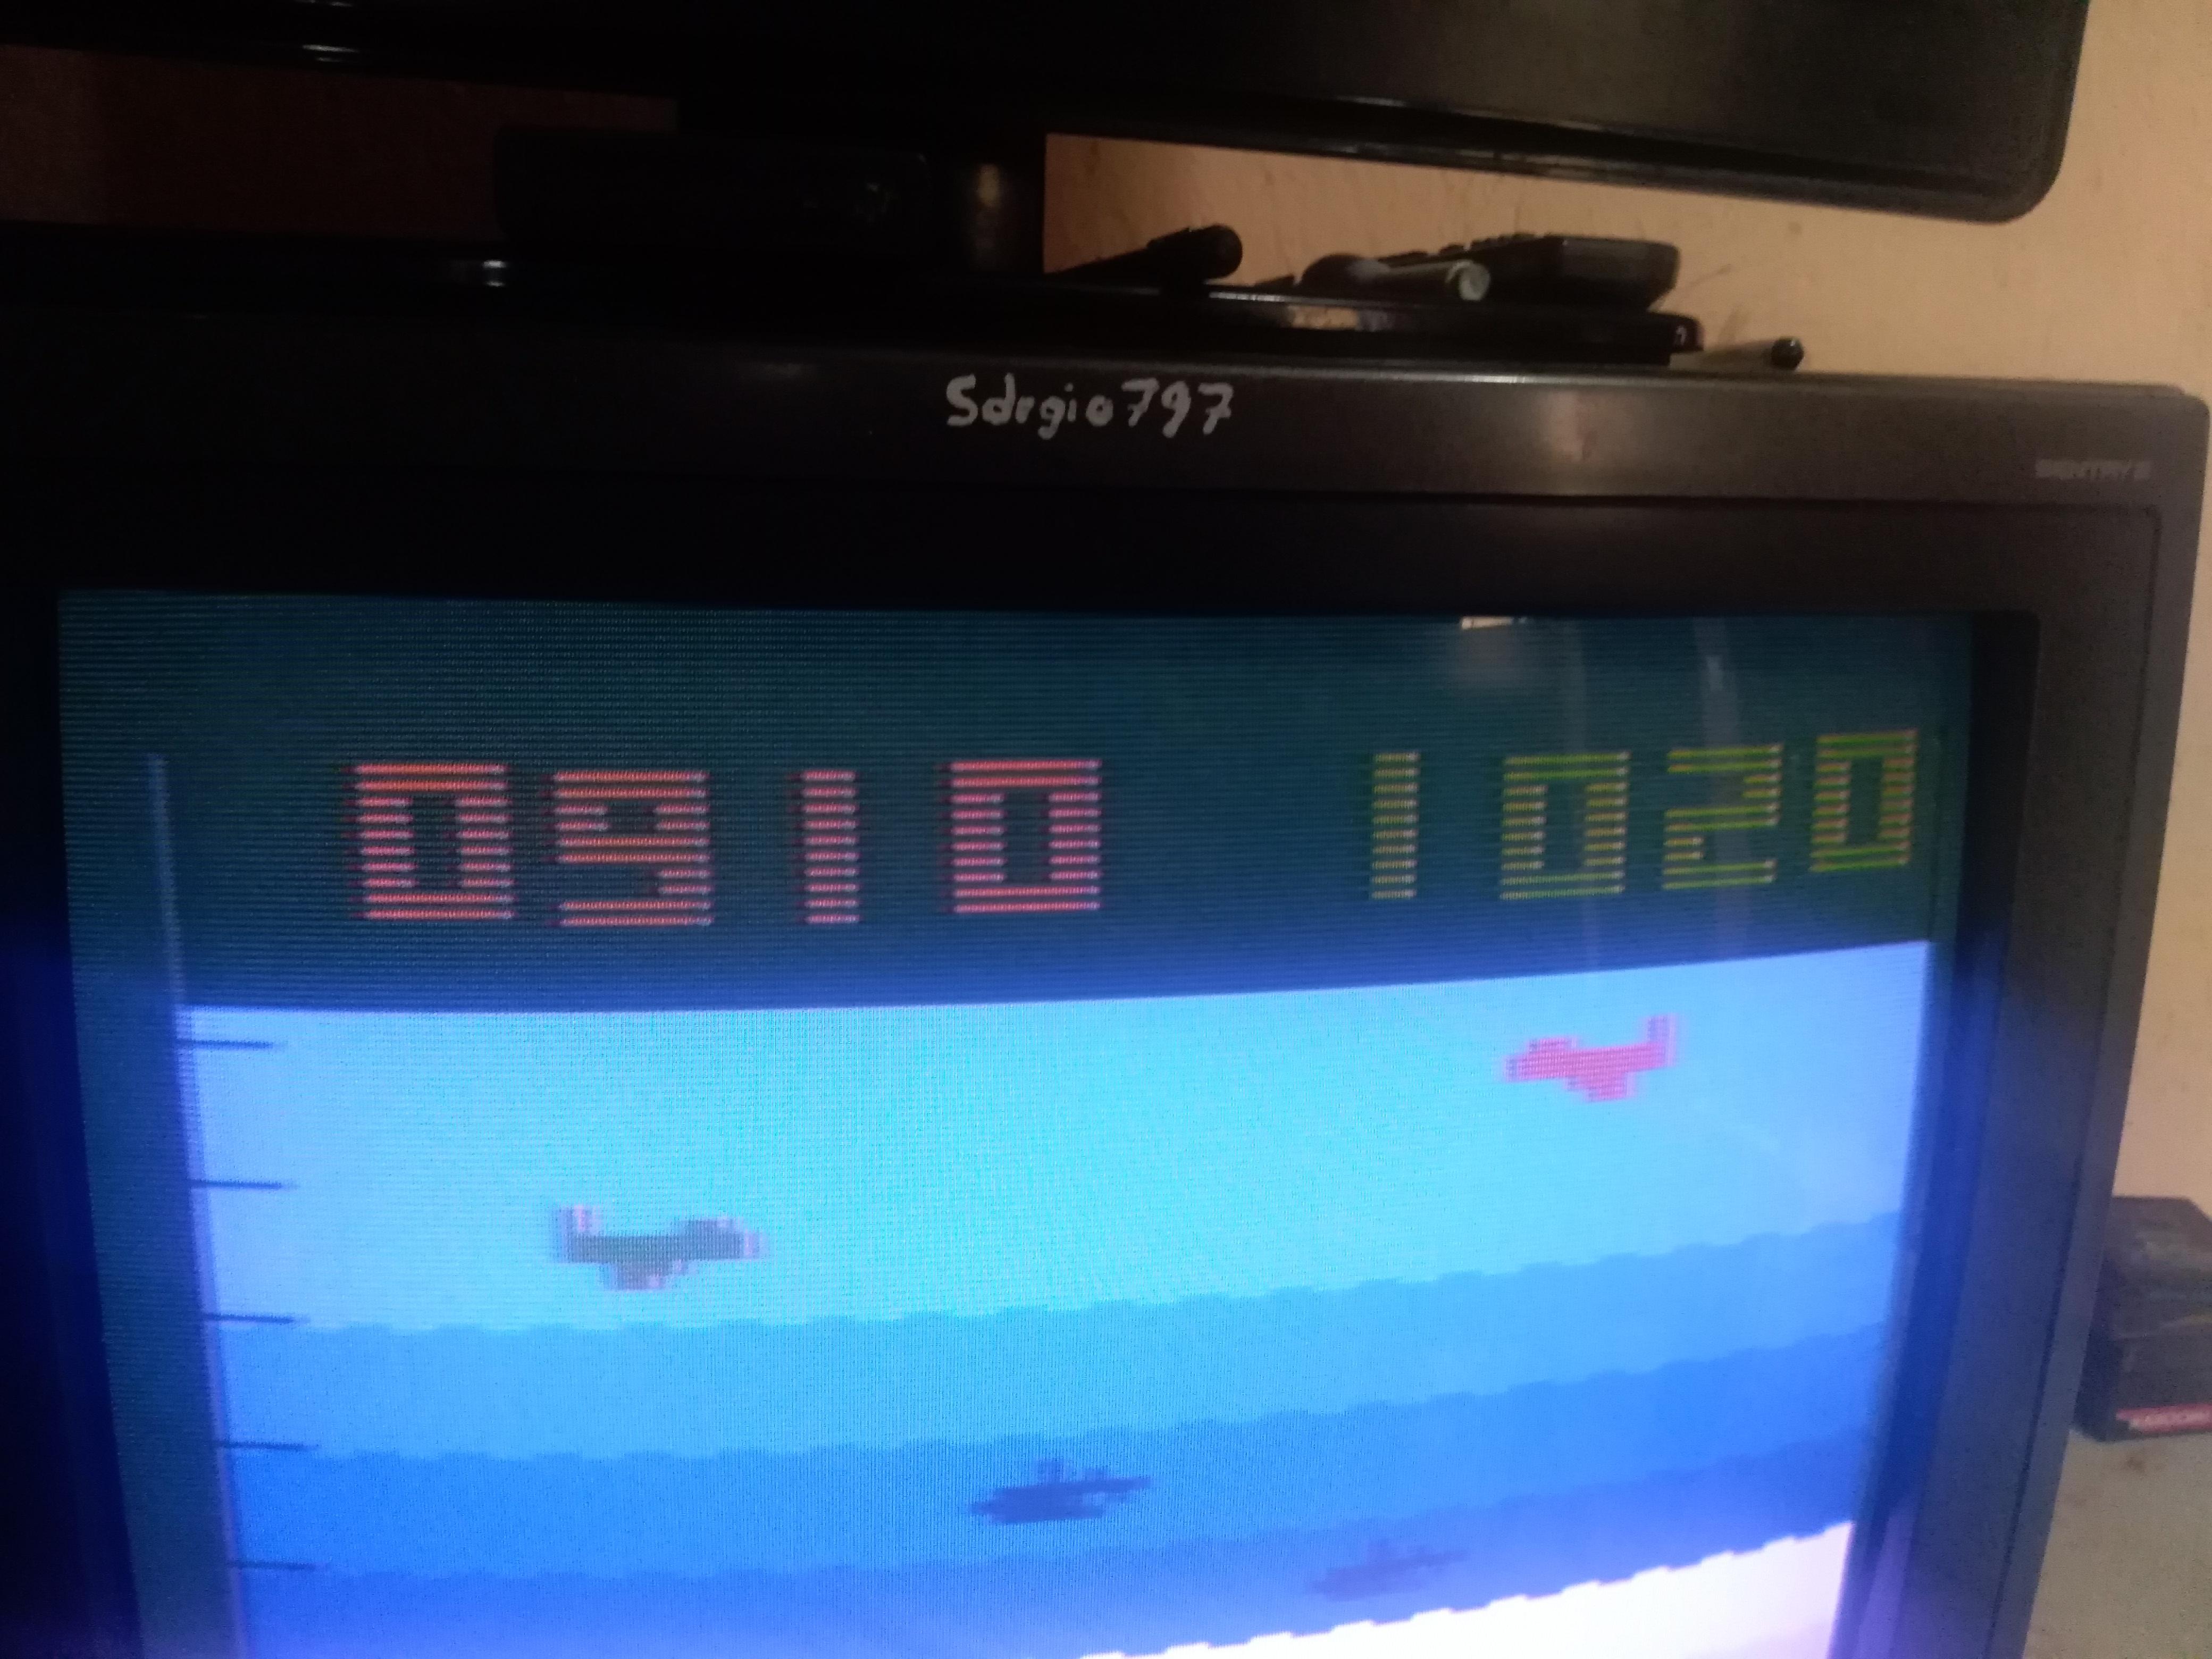 Sdrgio797: Canyon Bomber: Game 7 (Atari 2600 Novice/B) 1,020 points on 2020-07-05 02:30:41